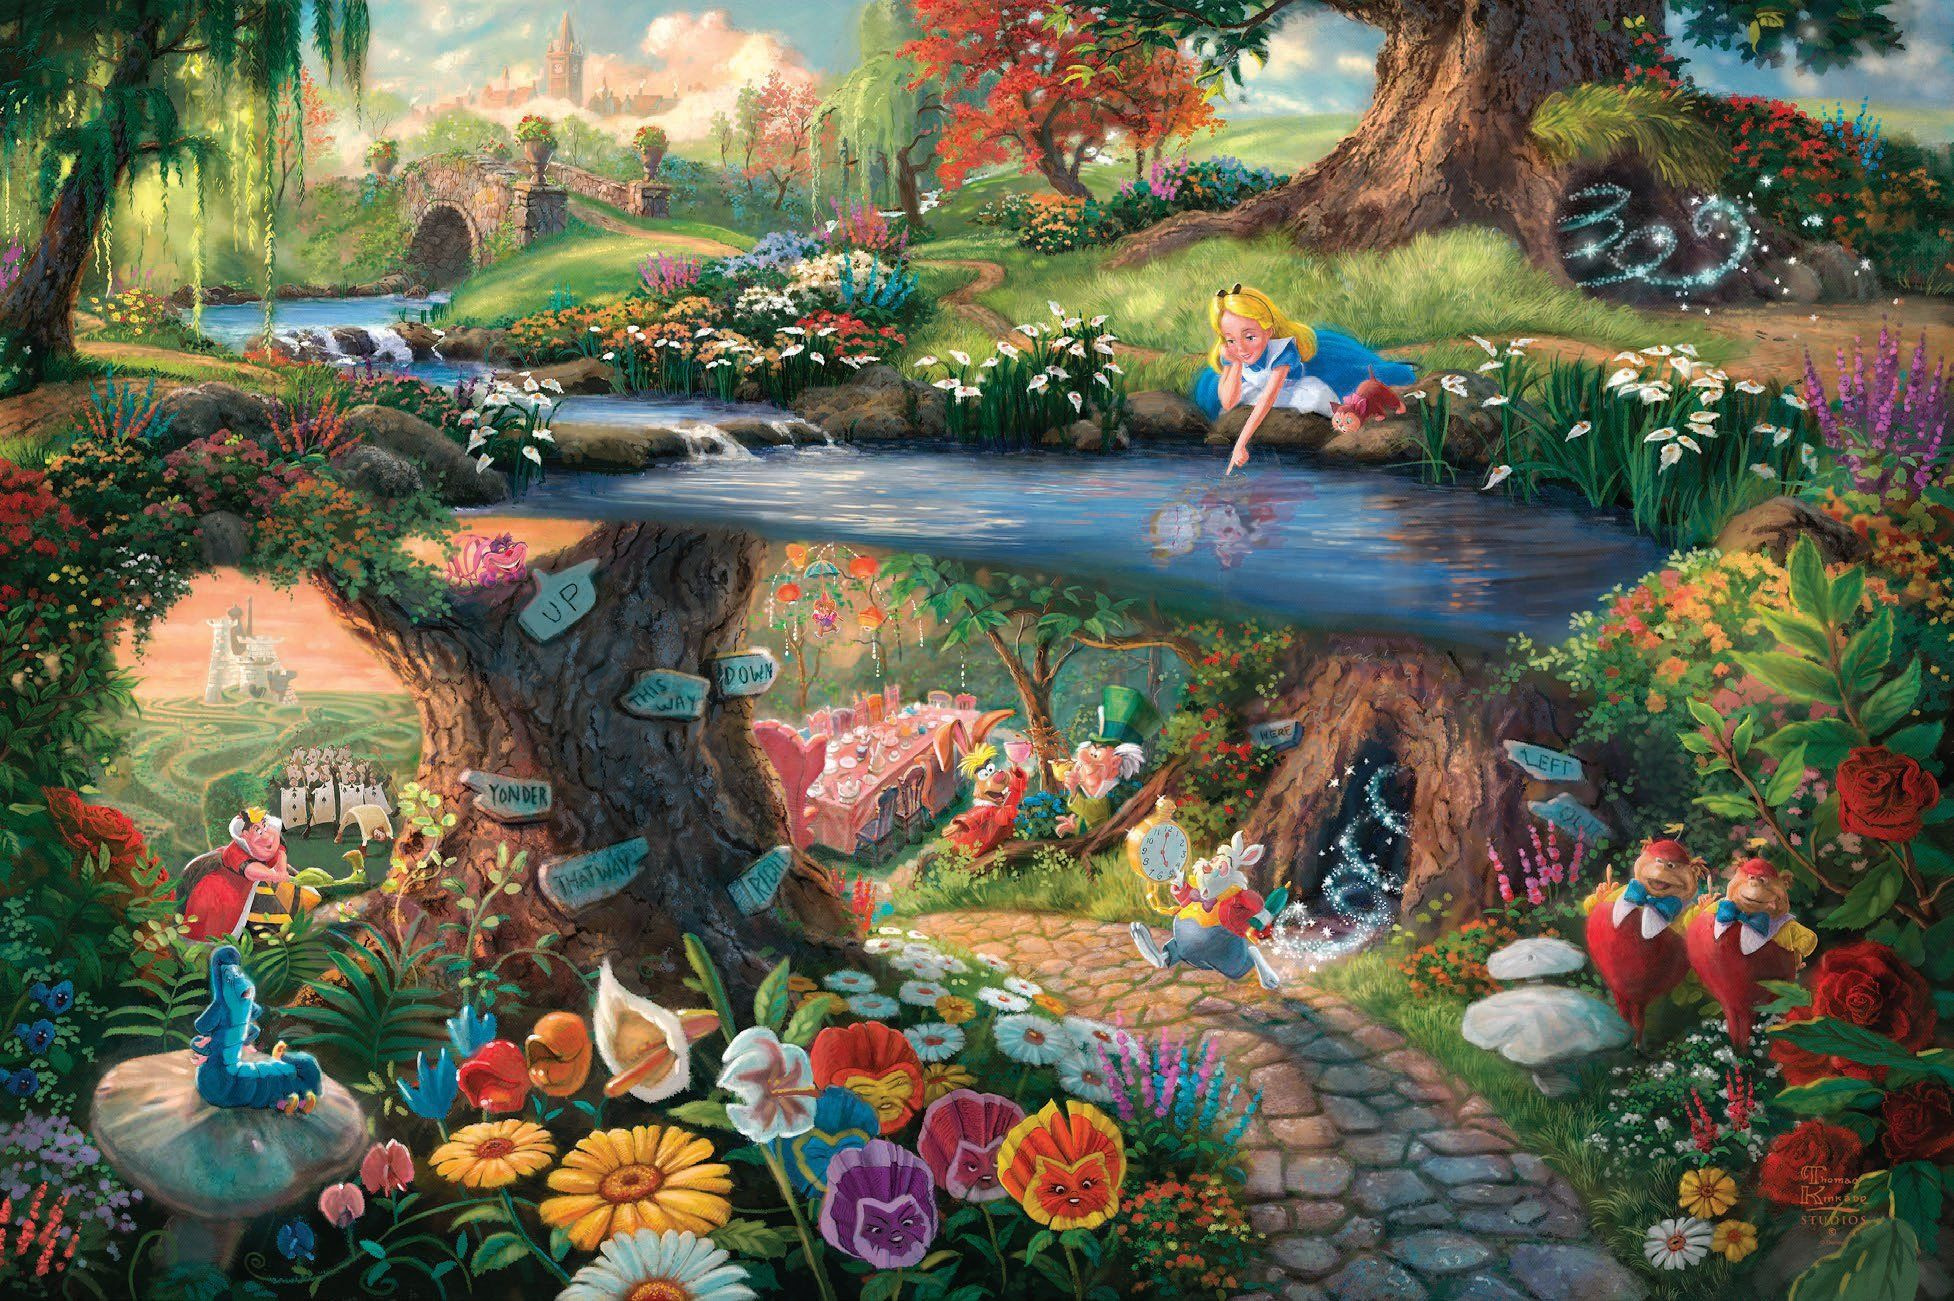 Pin By Luna George On Disney In 2020 Alice In Wonderland Paintings Alice In Wonderland Disney Thomas Kinkade Disney